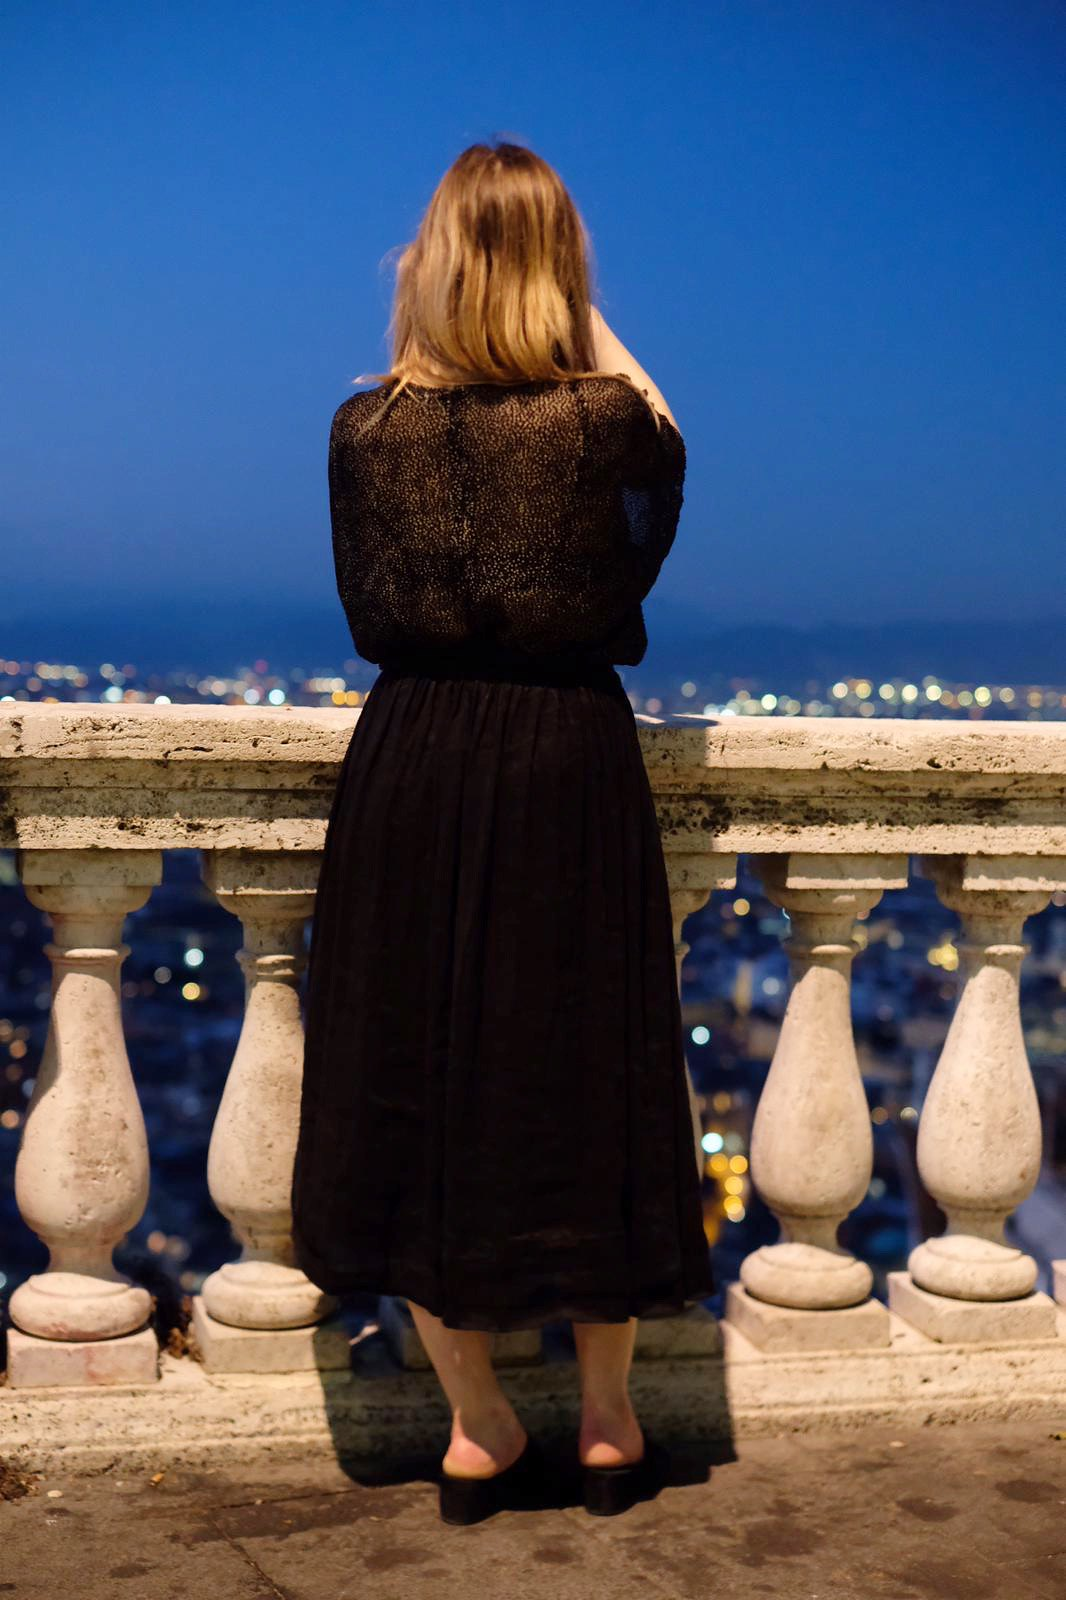 Largo San Martino - Napolin parhaat näkymät